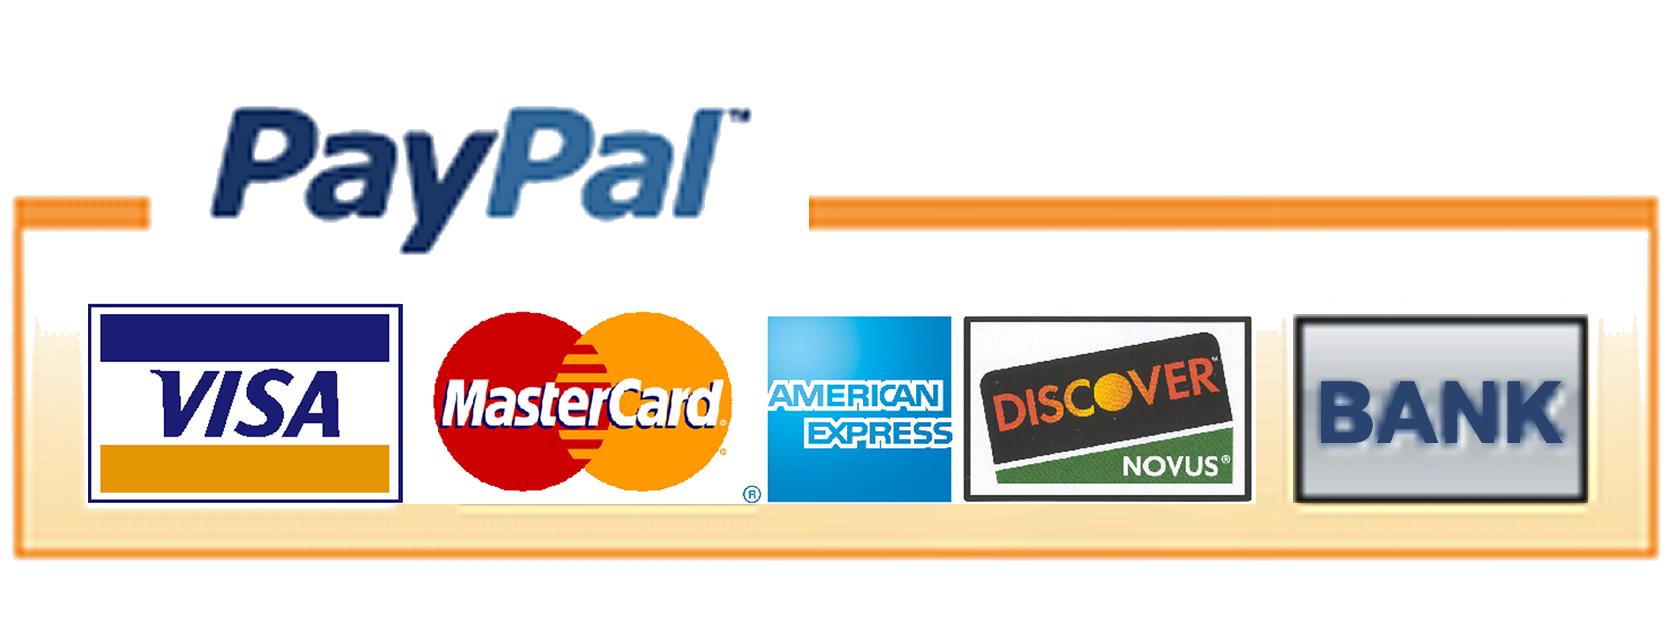 Paypal Visa Card